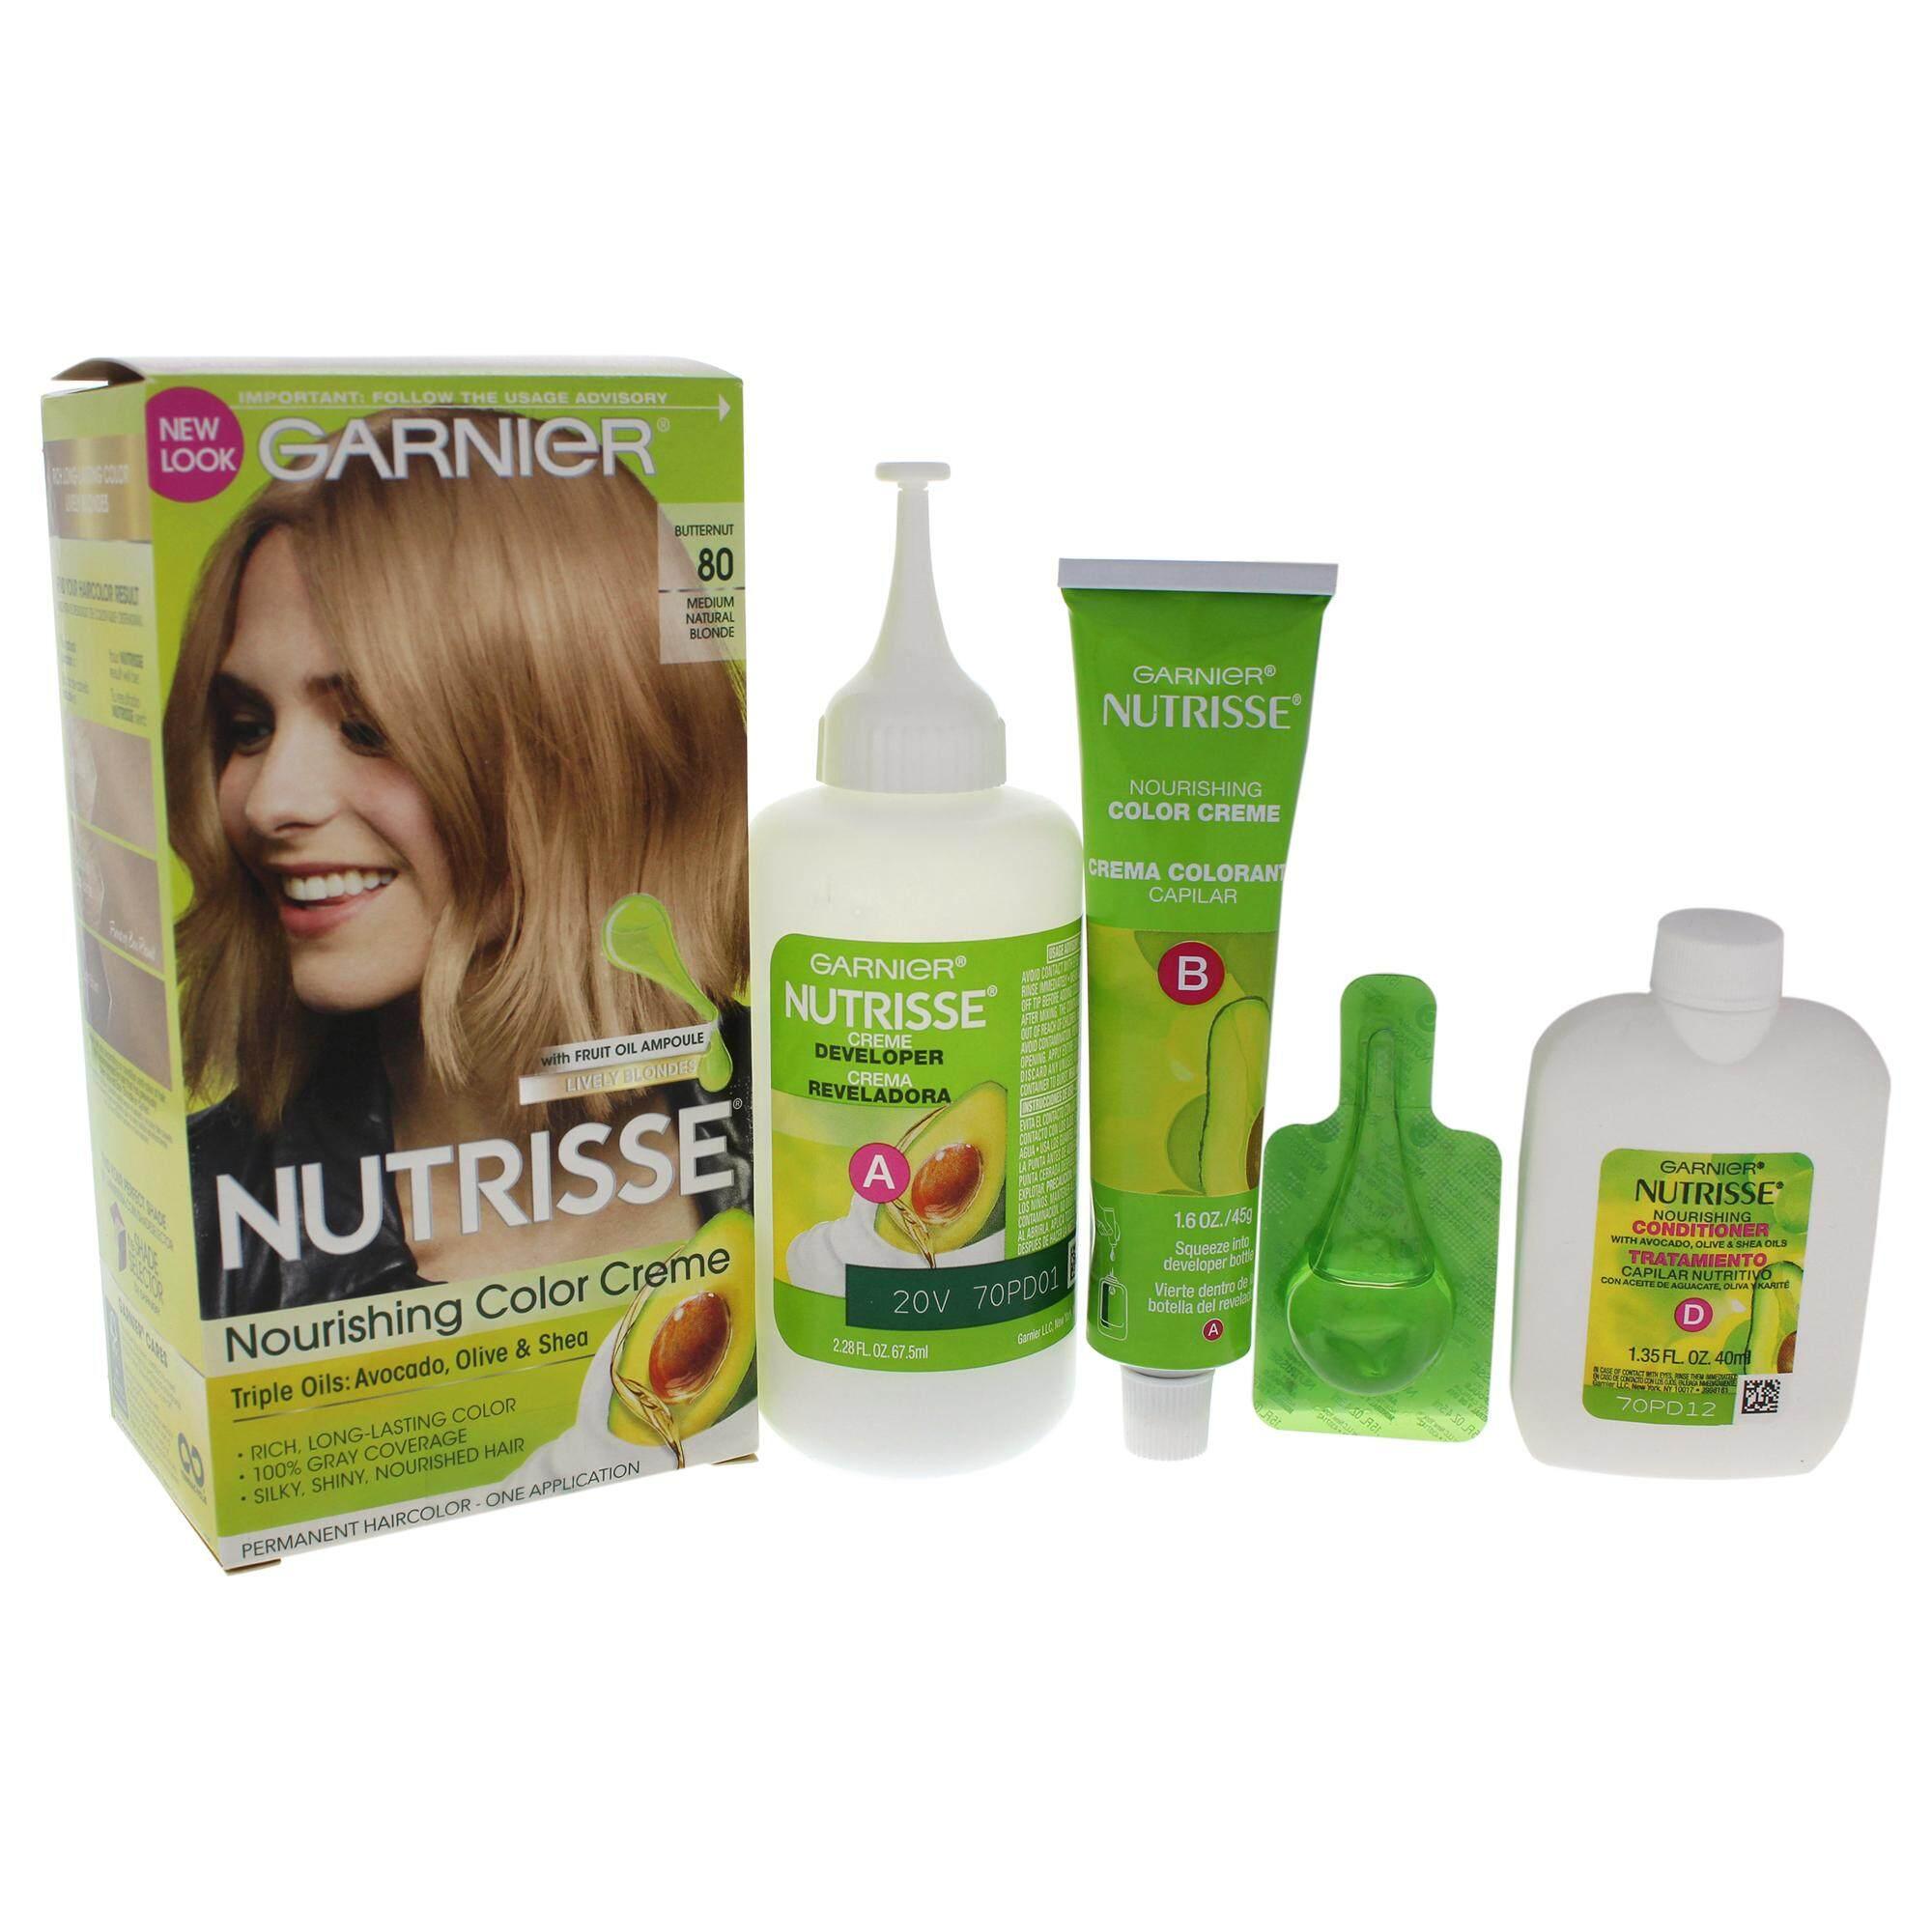 Garnier Hair Care - Hair Coloring price in Malaysia - Best Garnier ...